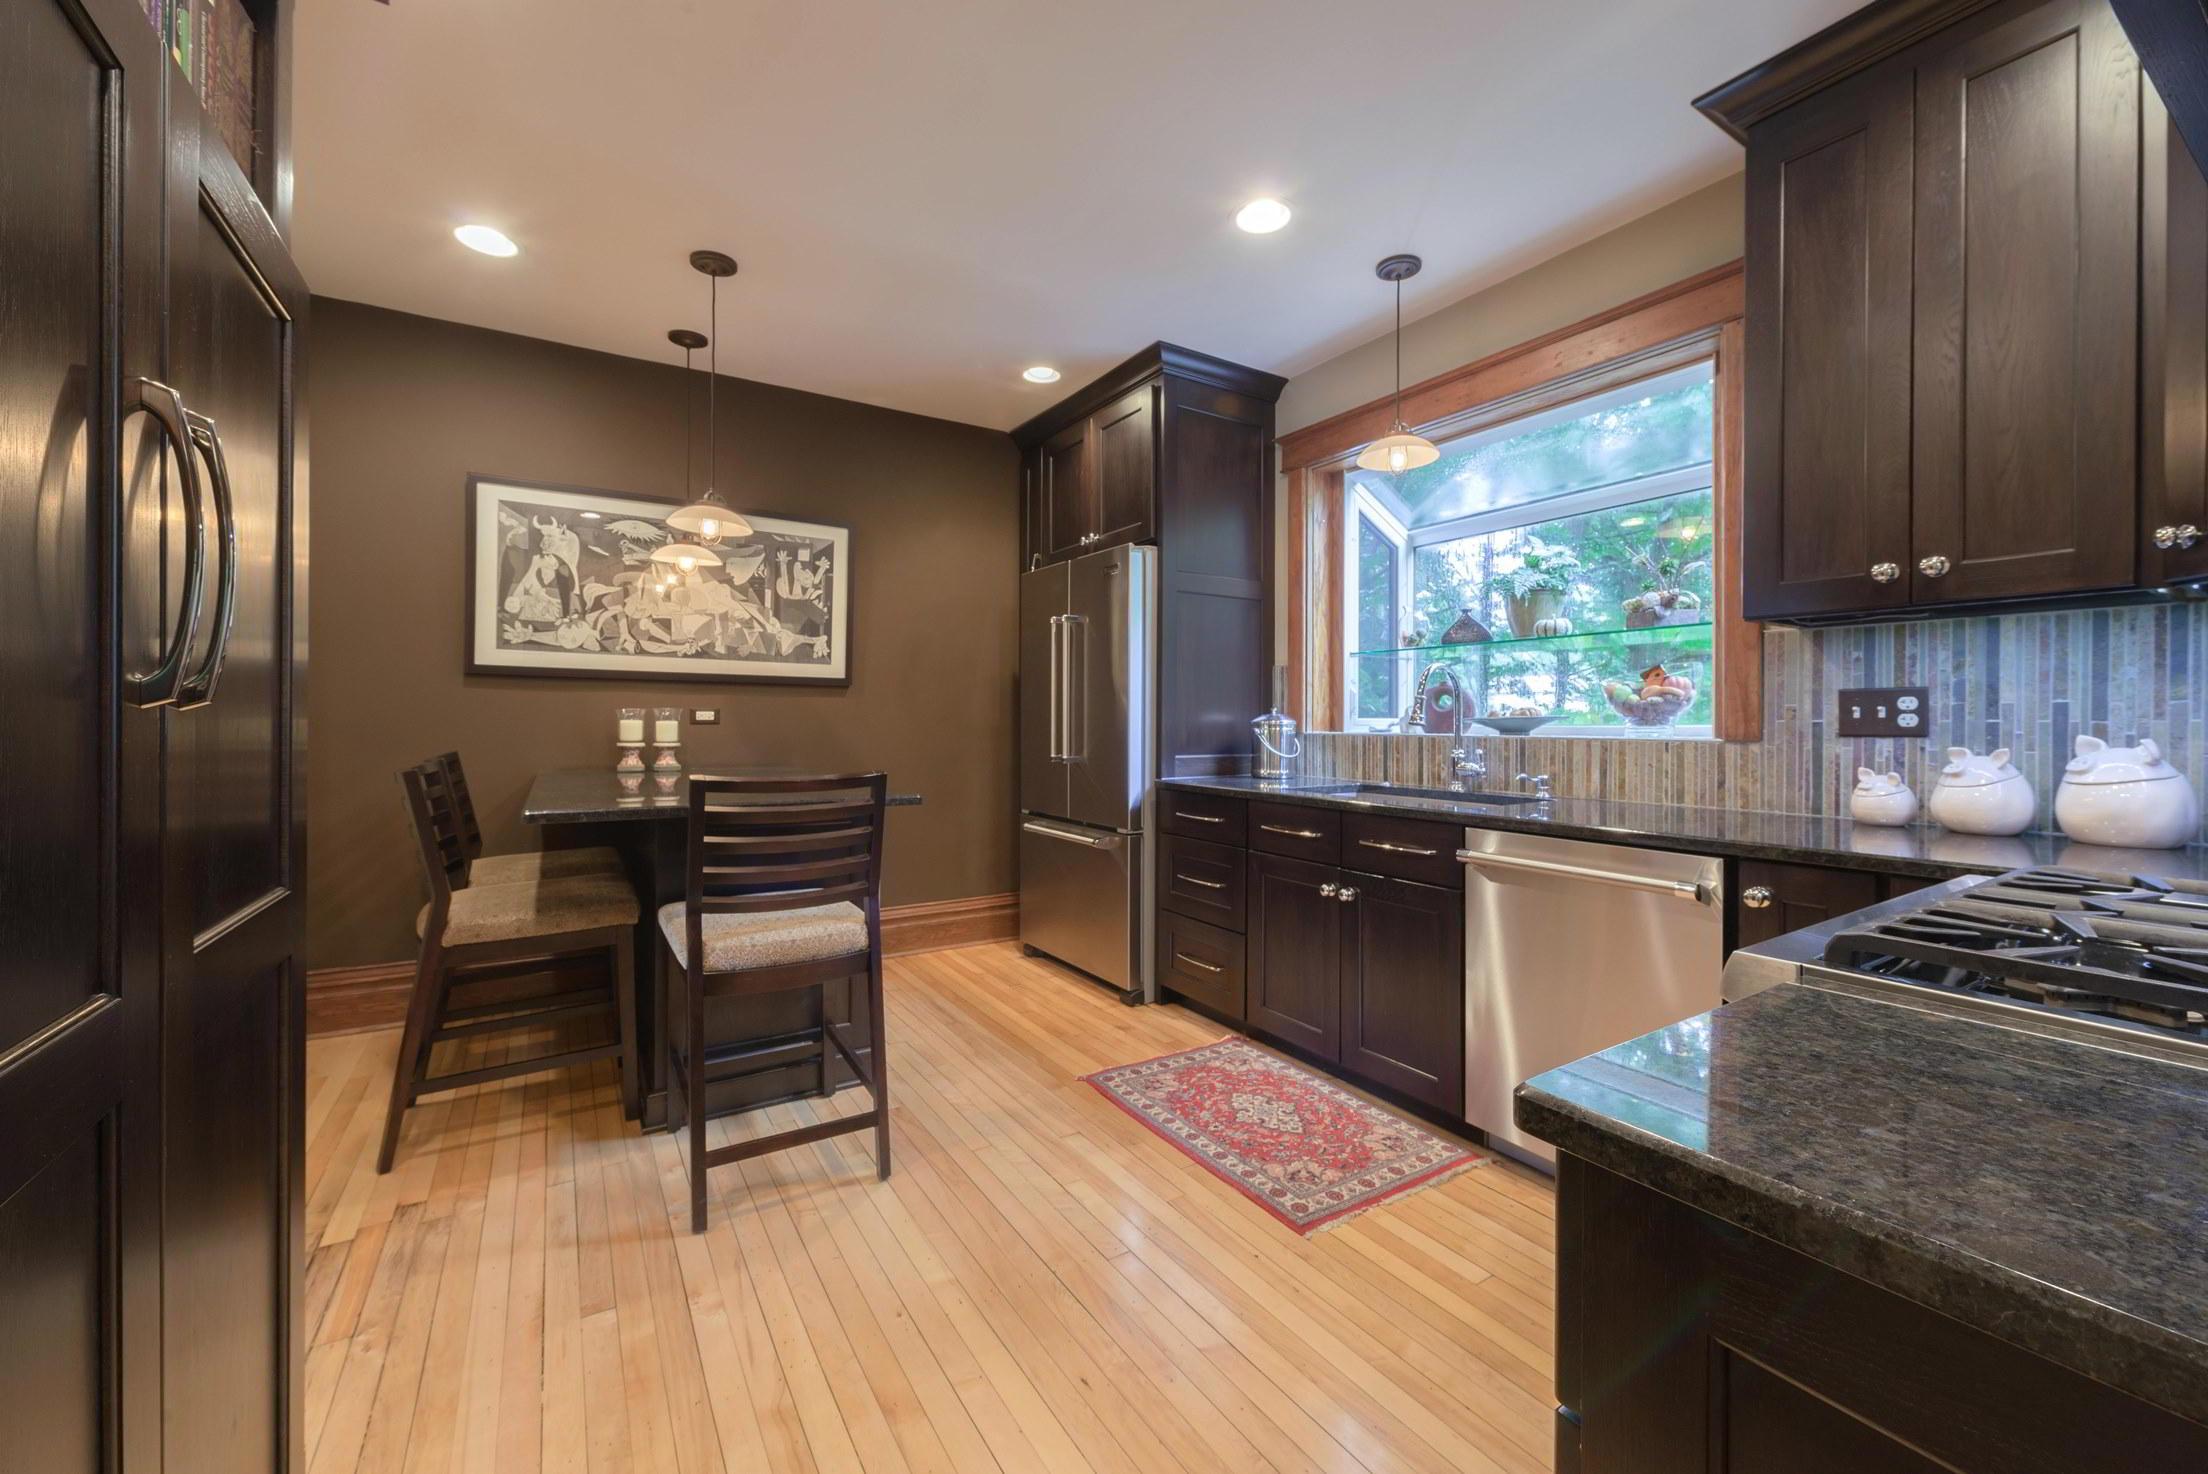 Kitchen Design Consultation | Interior Designer Geneva IL | Kitchen Remodeling St. Charles